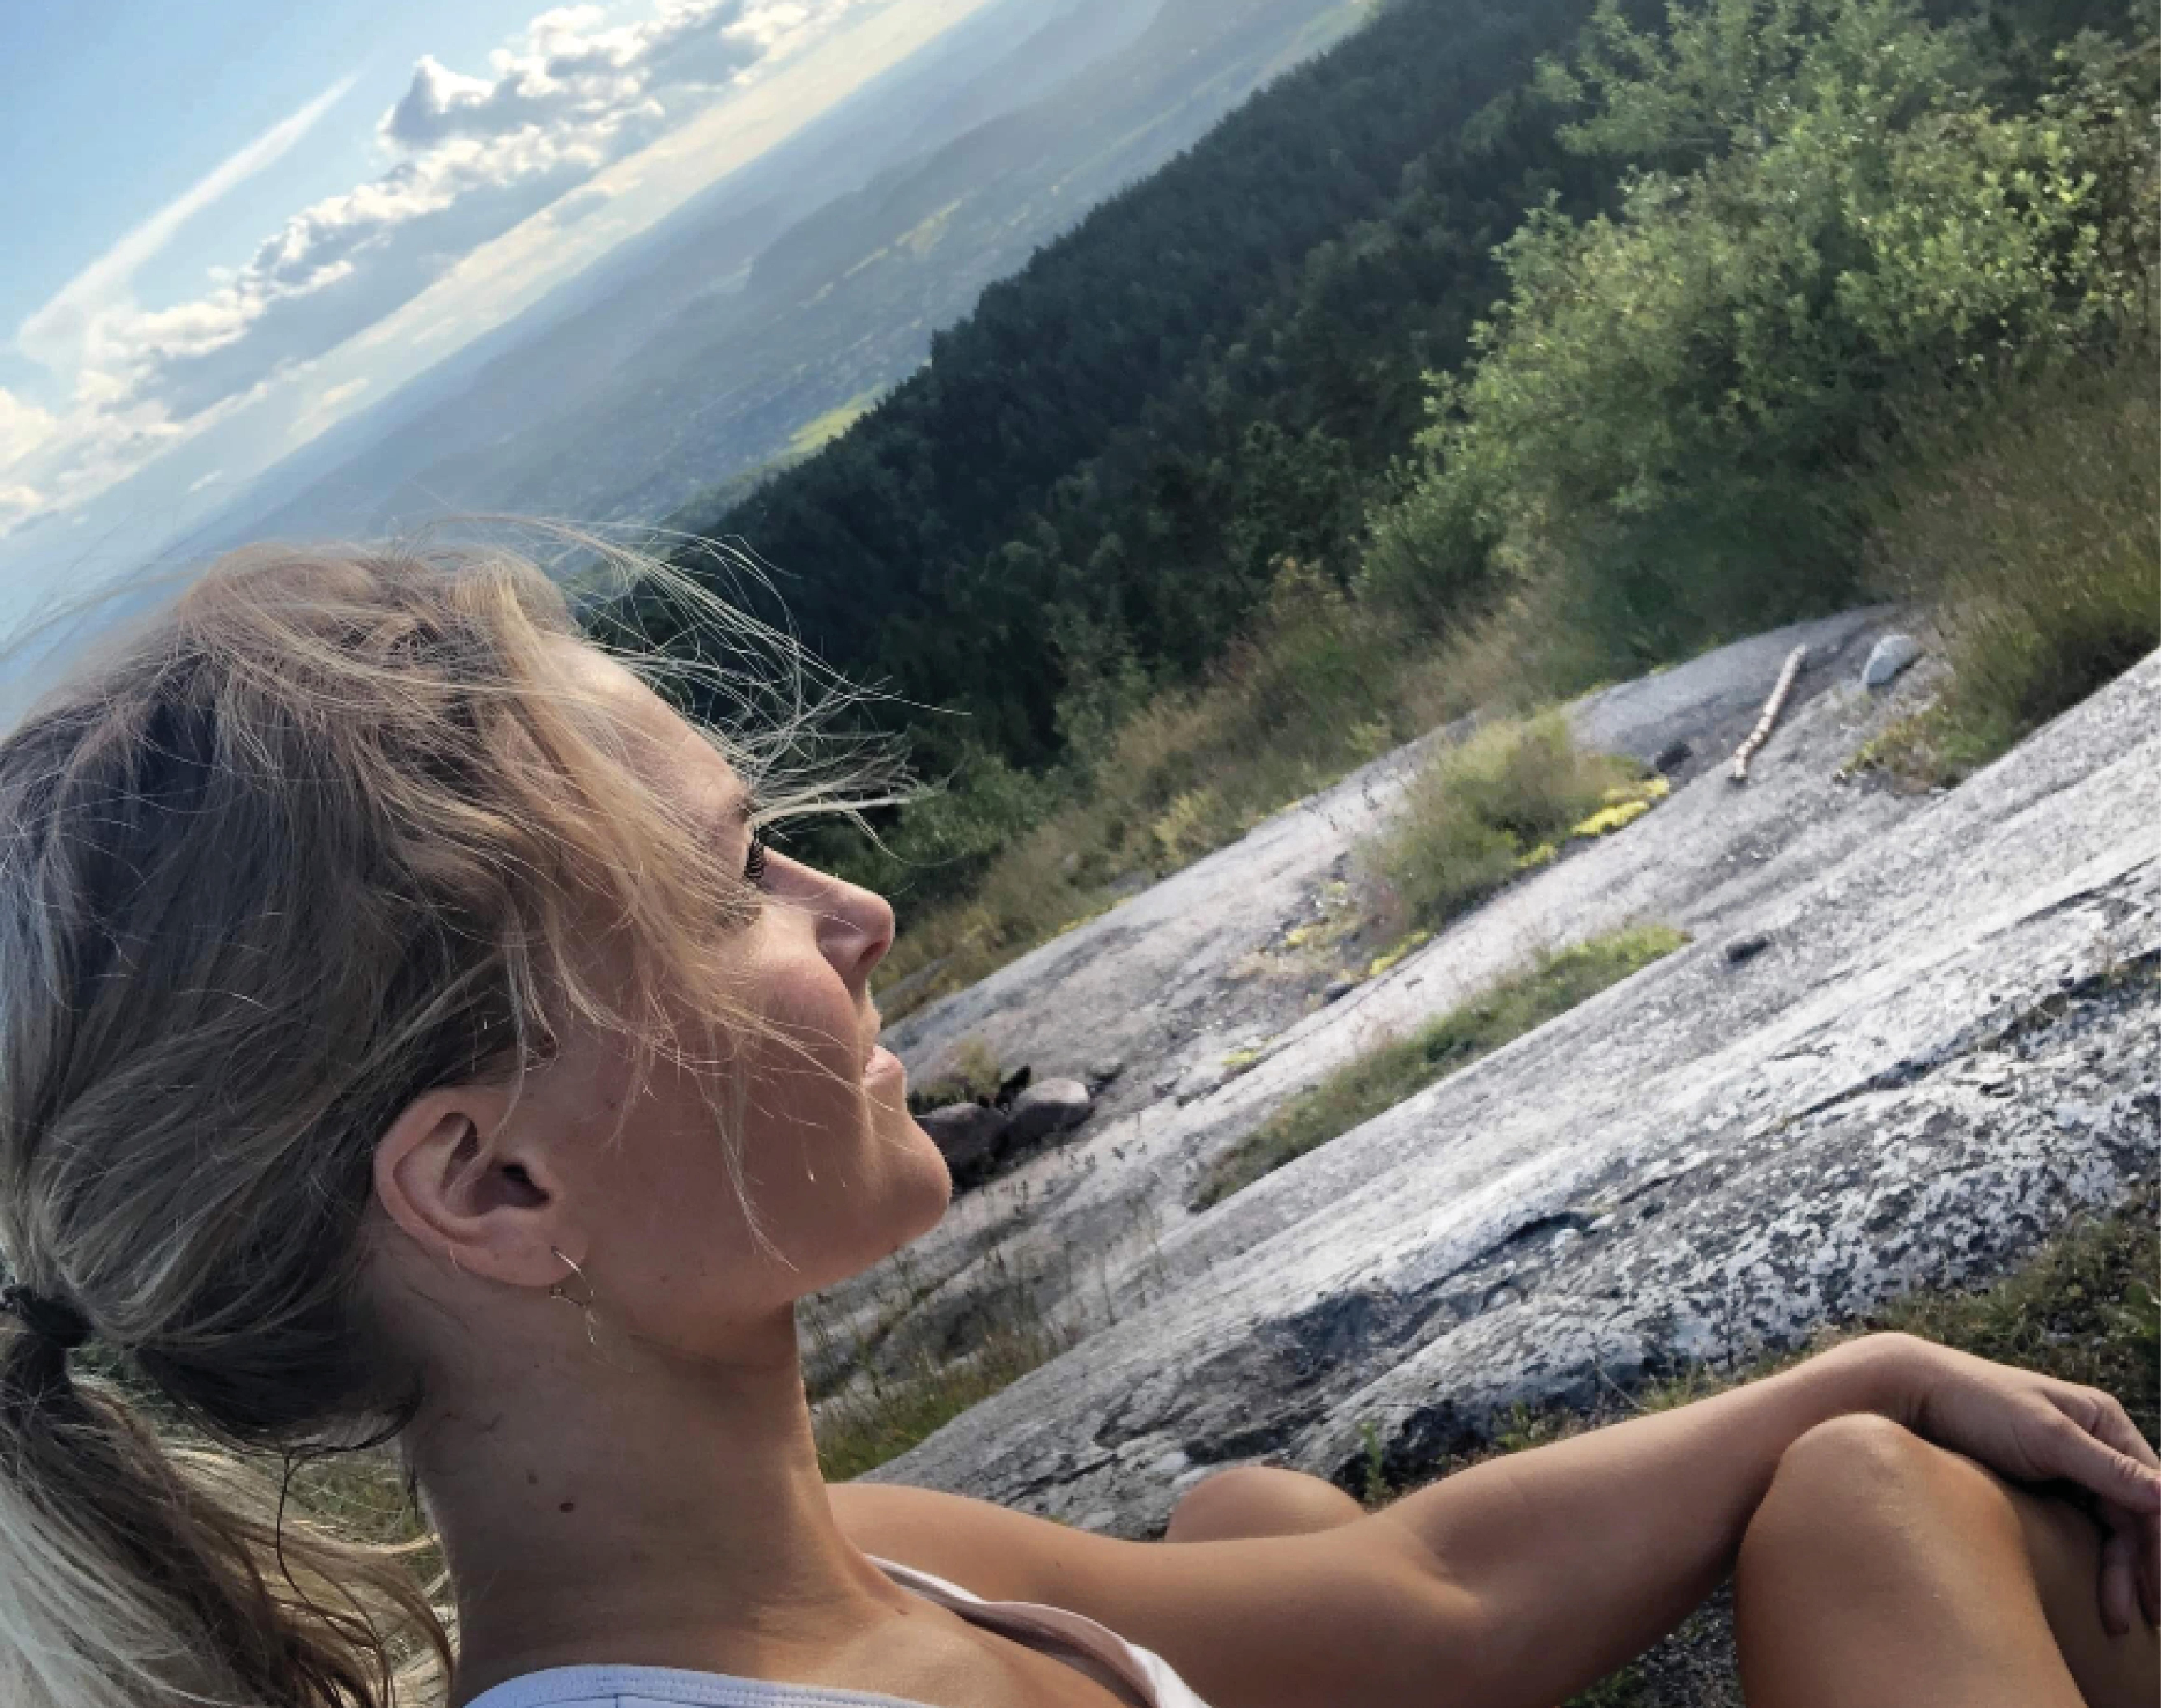 Women enjoying the view on a mountain top after running